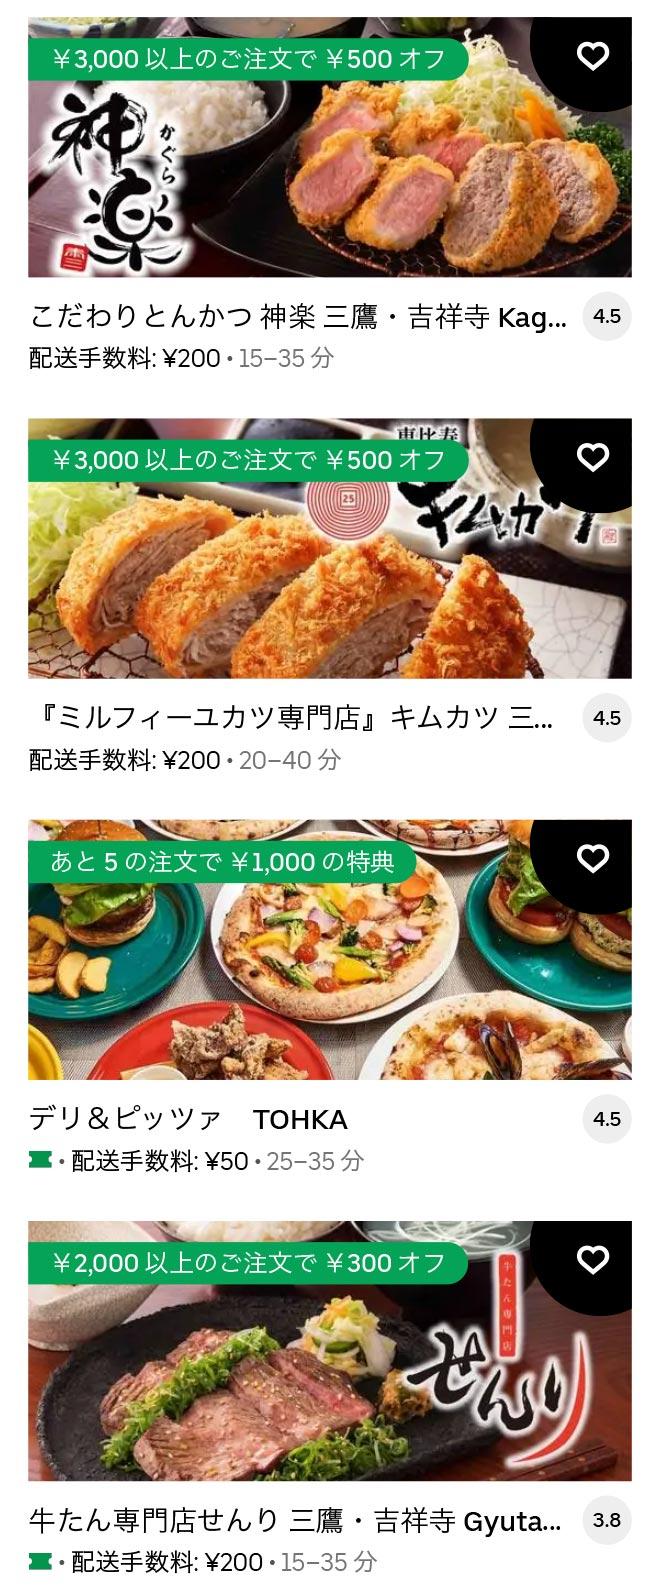 U tanashi 2105 10